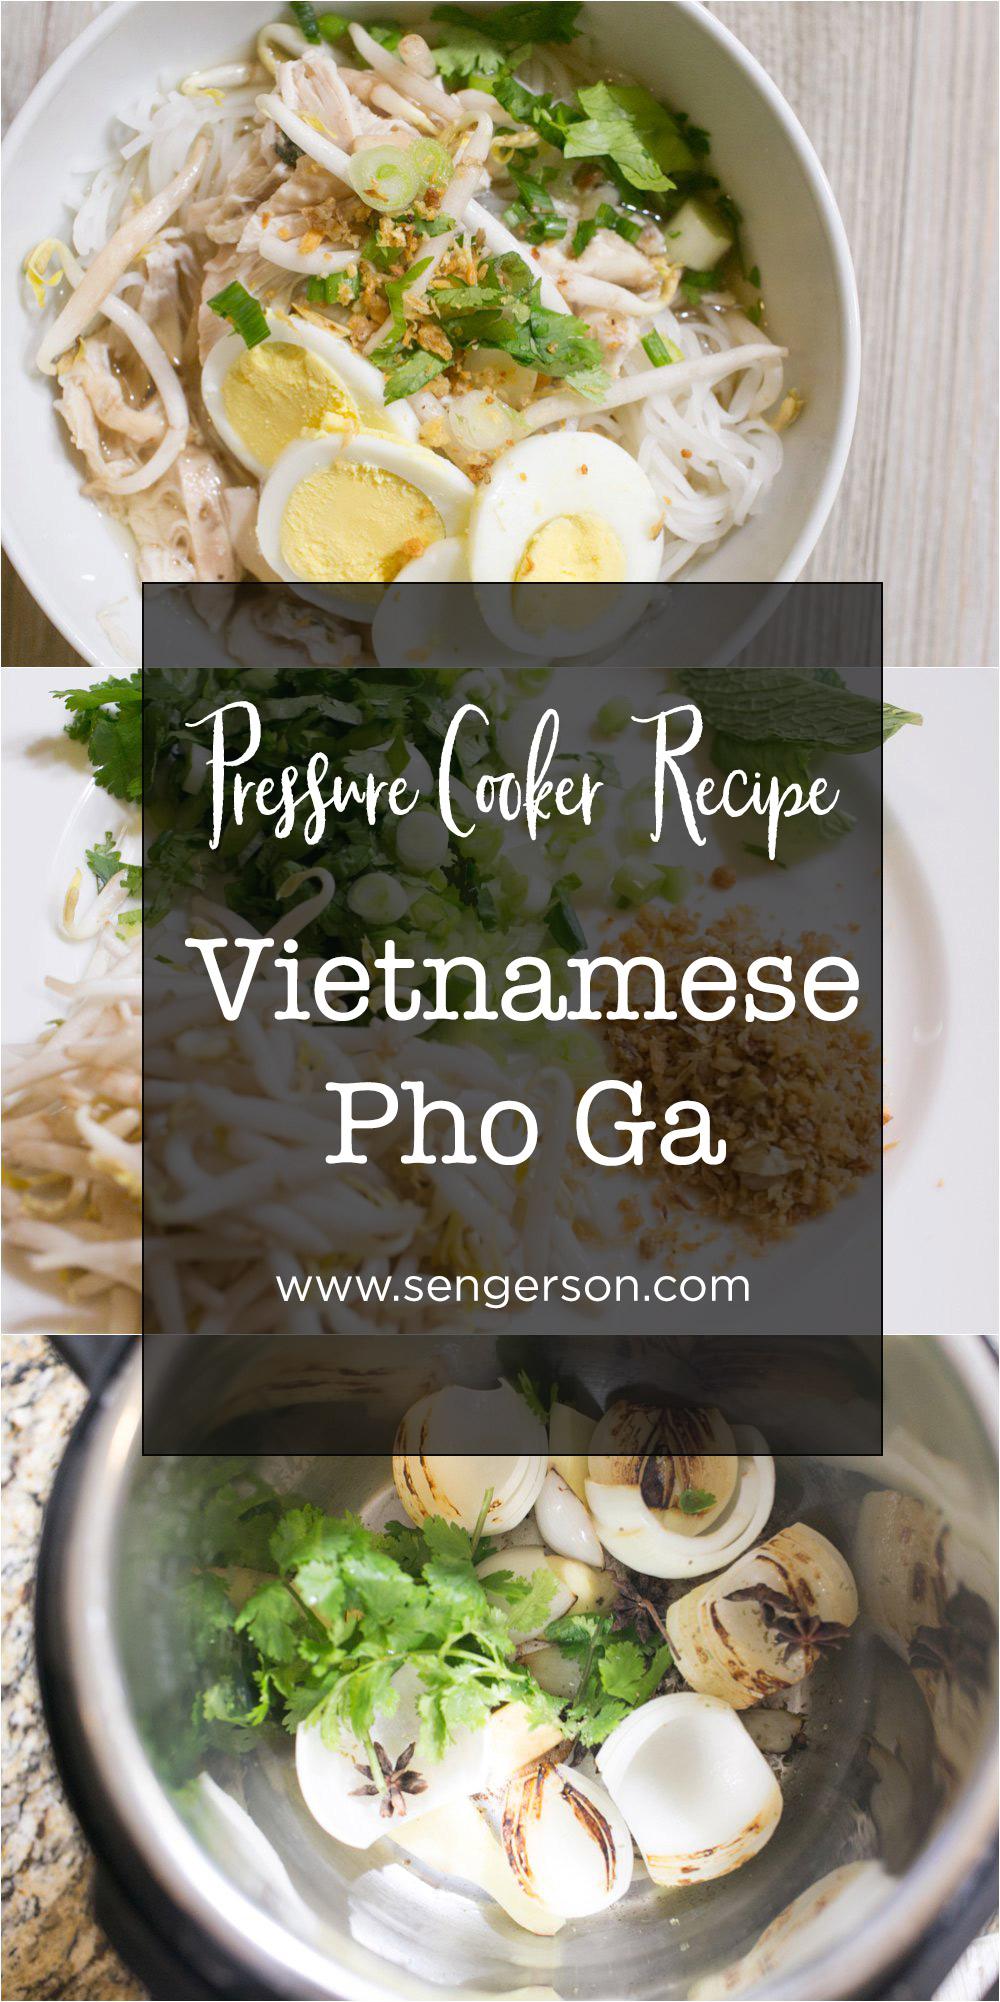 Easy vietnamese pho ga recipe using the pressure cooker.